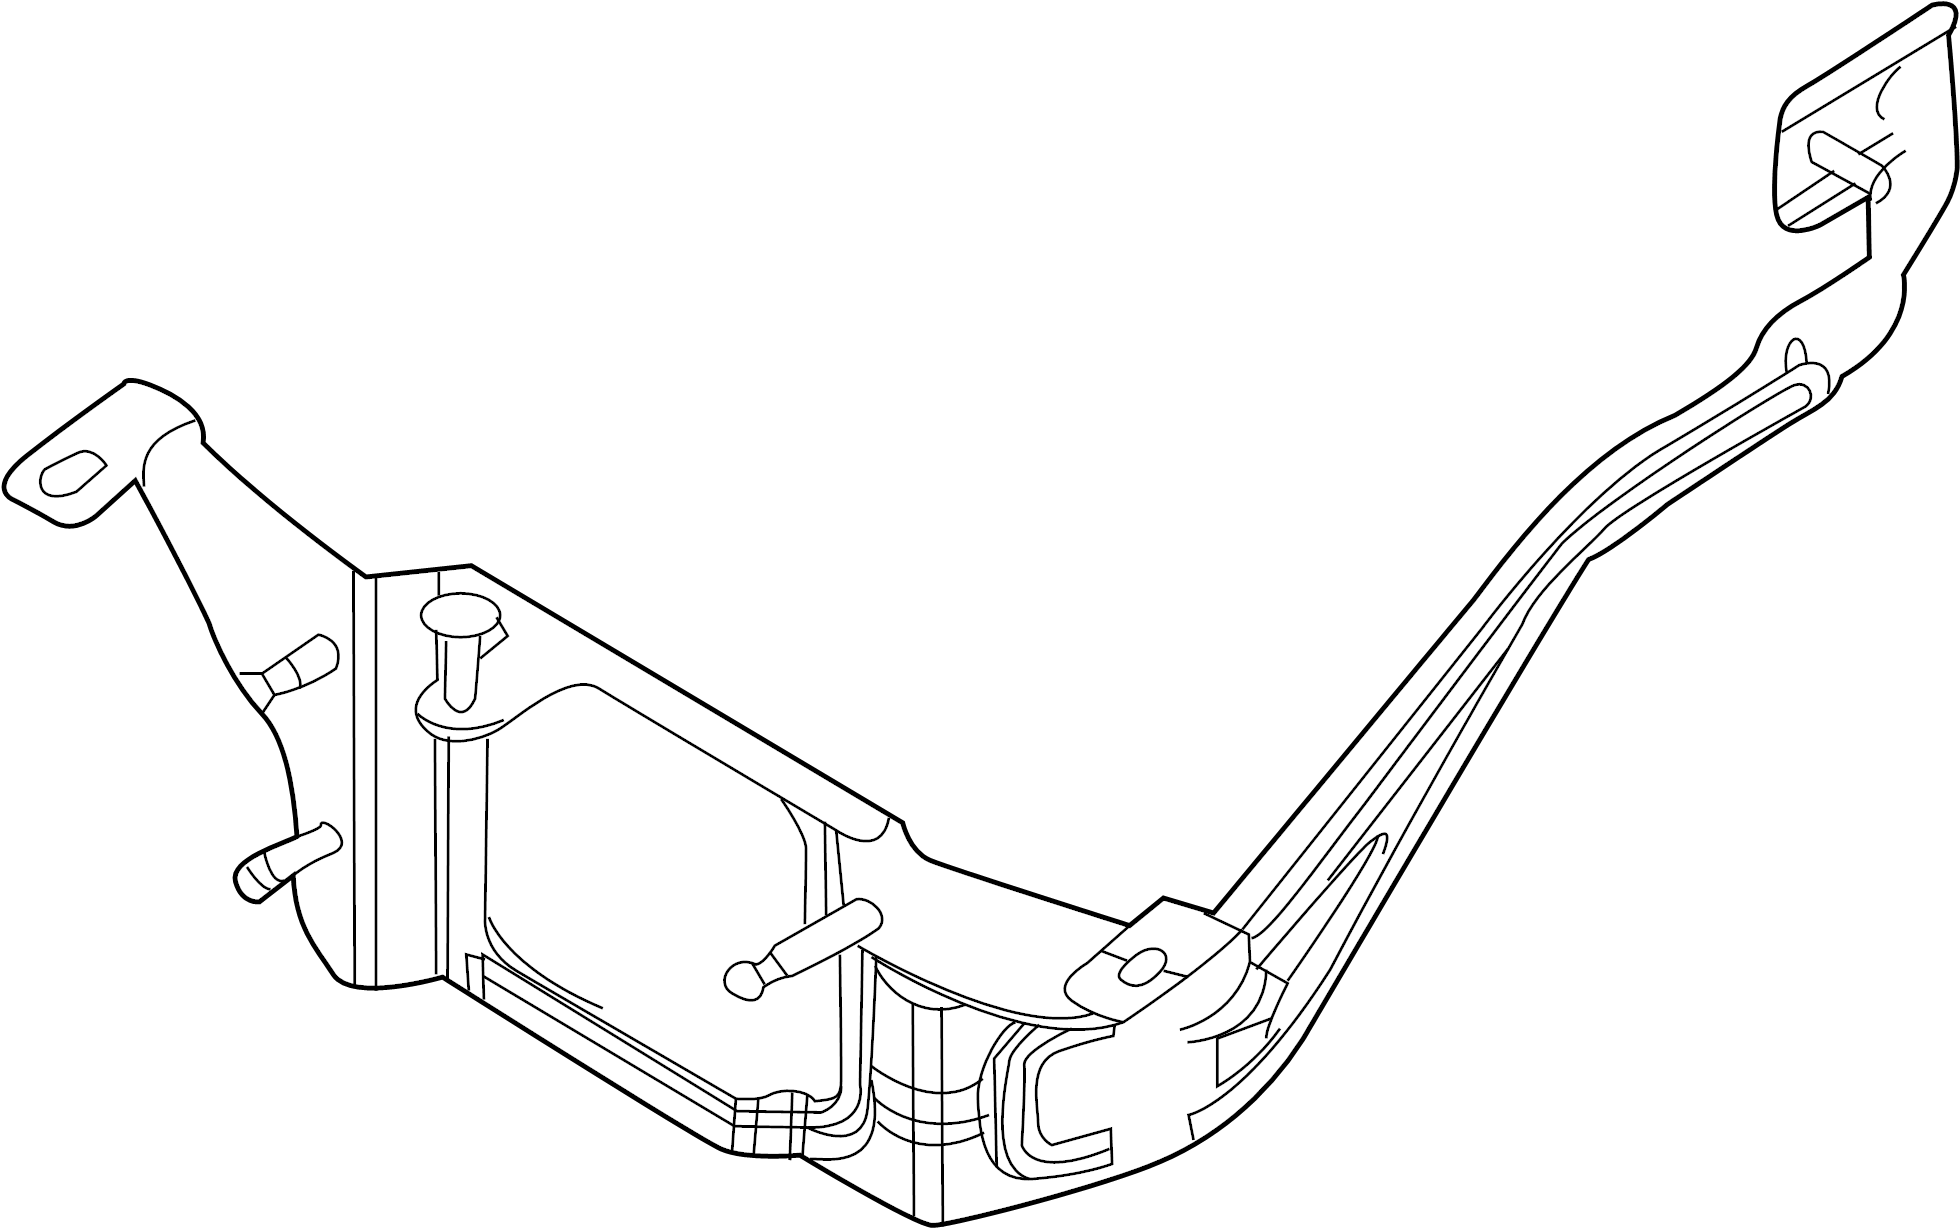 Ford Taurus Cruise Control Distance Sensor Bracket